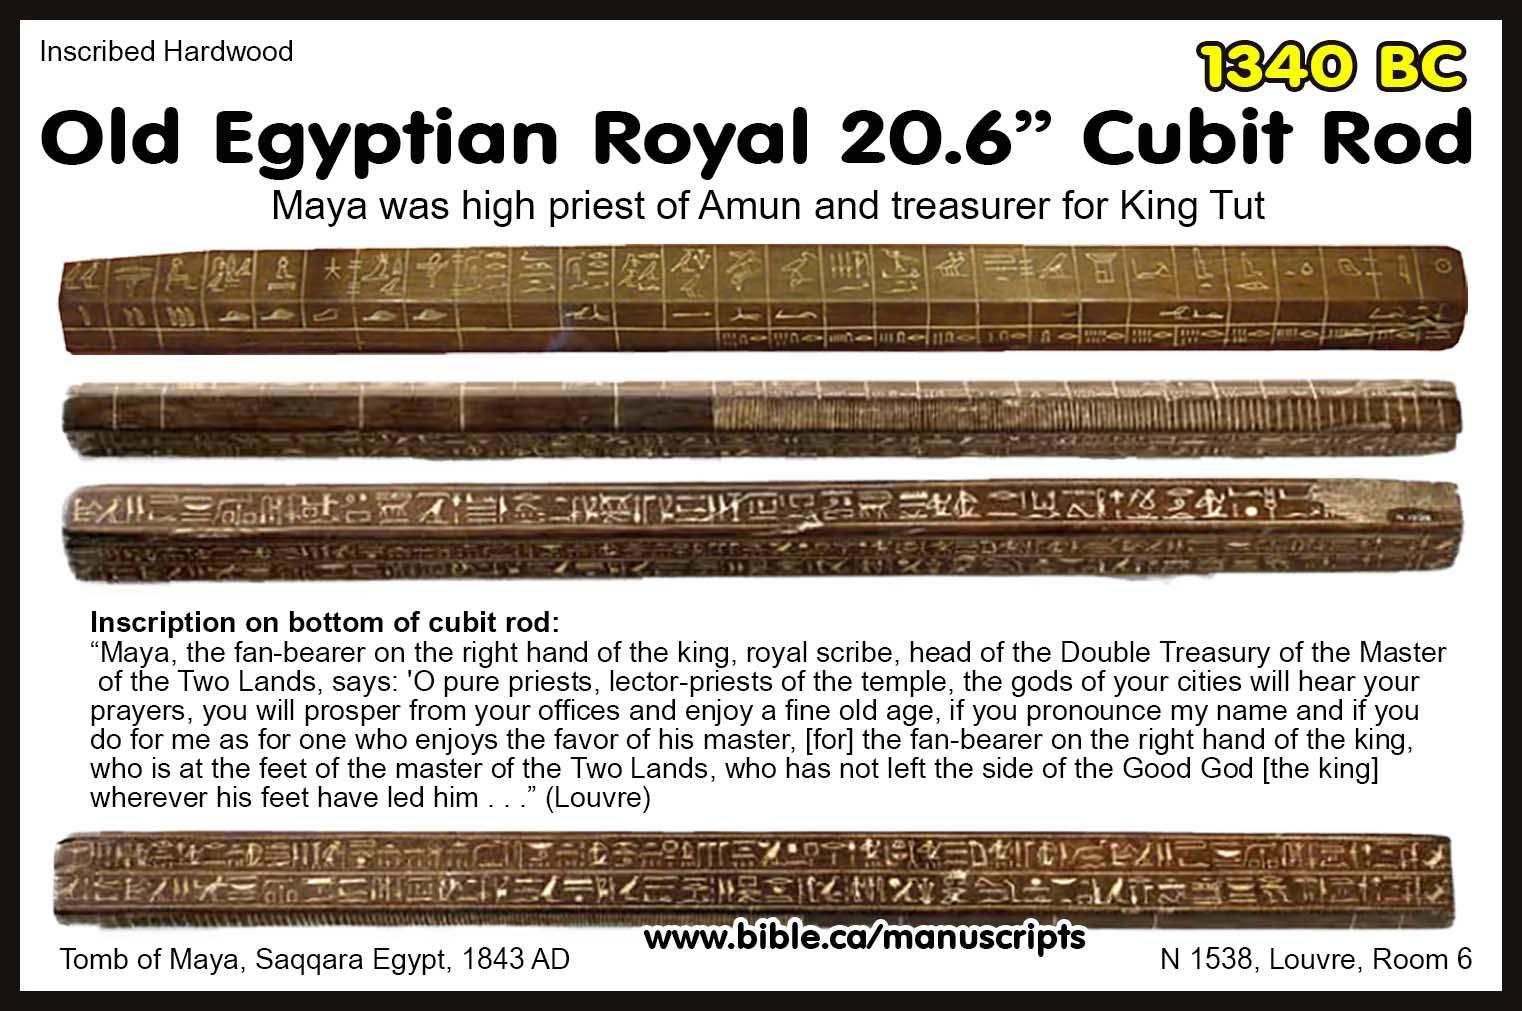 https://www.bible.ca/manuscripts/bible-inscriptions-archeology-cubit-measuring-rod-stick-523mm-20.6-inches-hardwood-tomb-Maya-treasurer-Pharaoh-Tutankhamun-King-Tut-Horemheb-1340bc.jpg